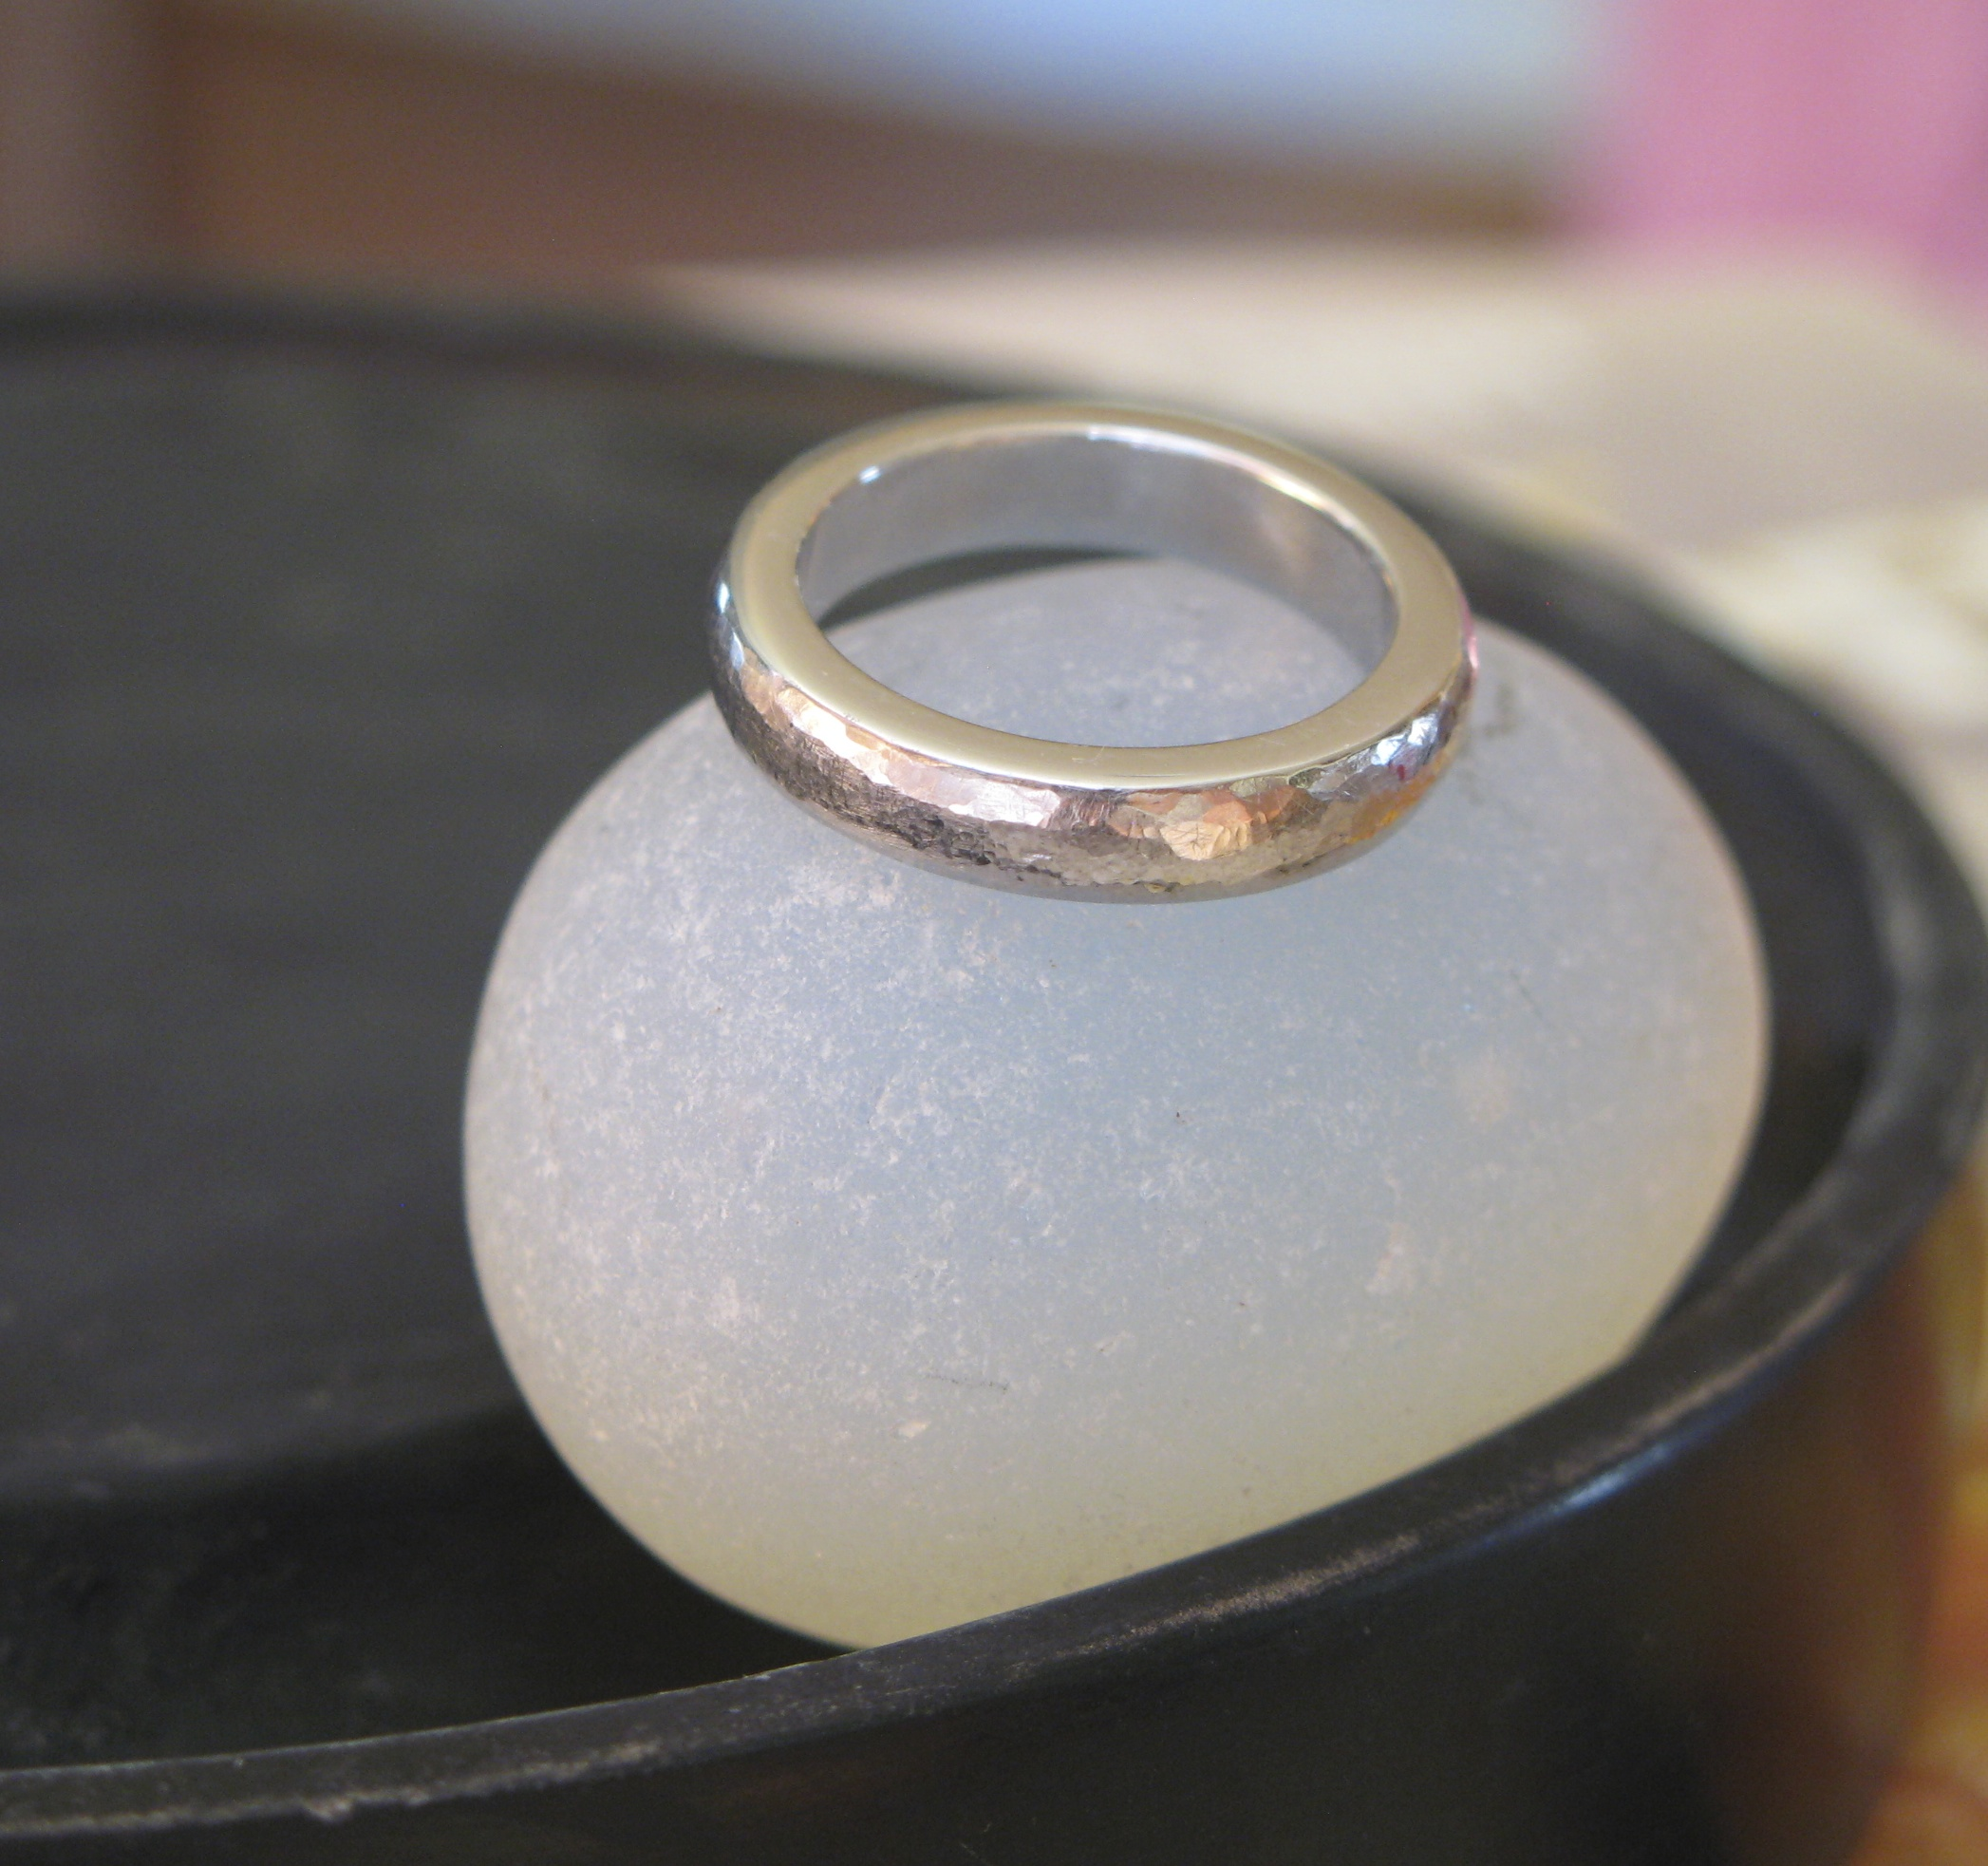 Hannah's ring